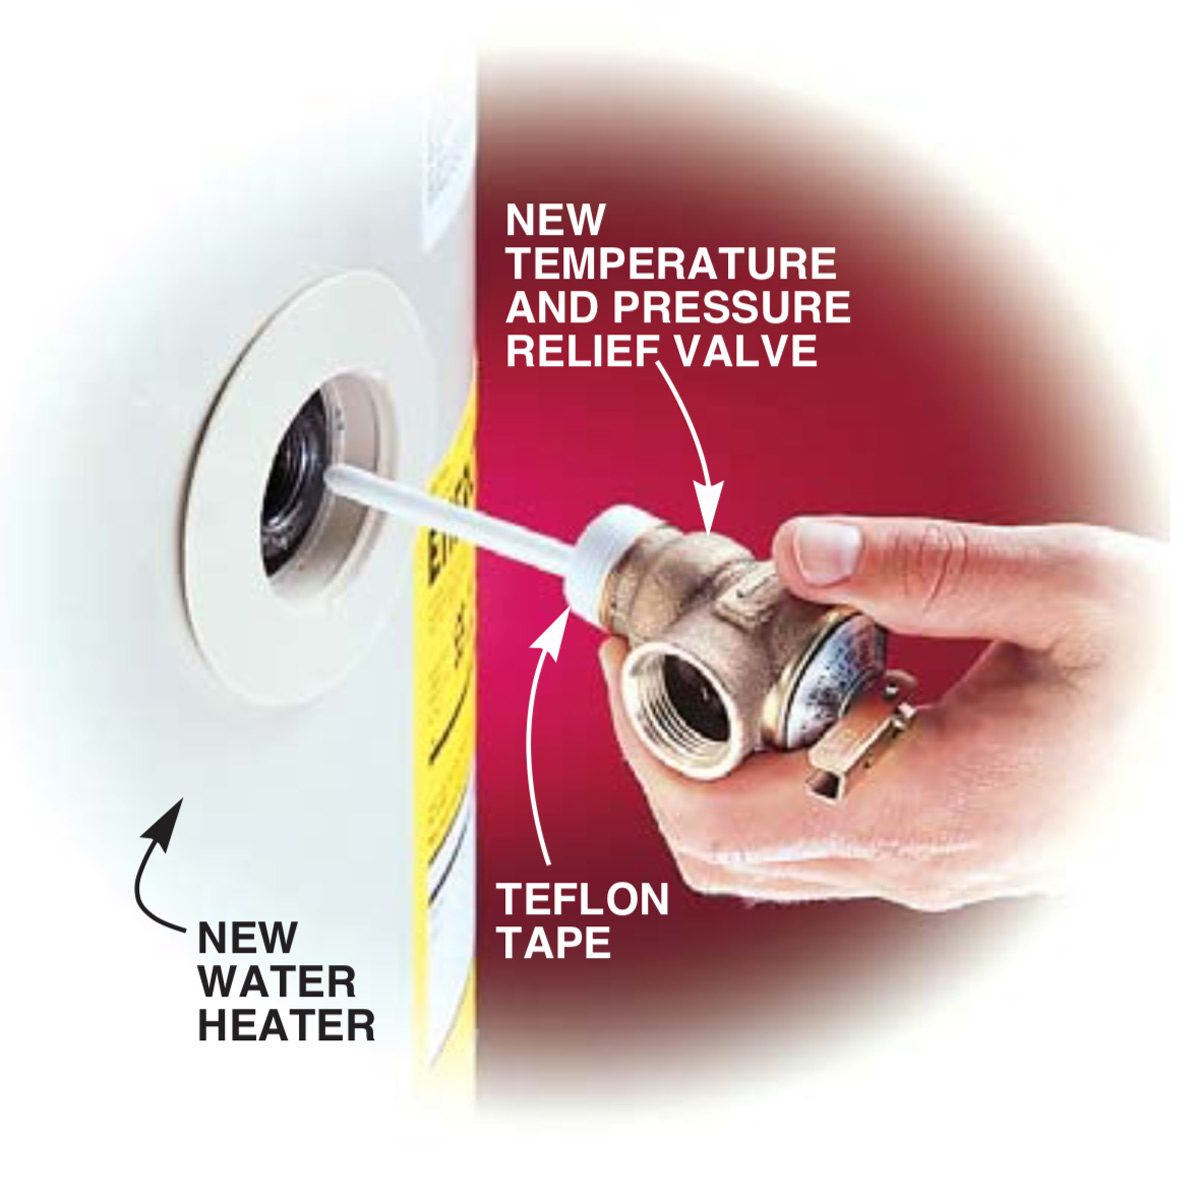 Hot Water Heater Wiring Diagram Additionally Water Heater Wiring